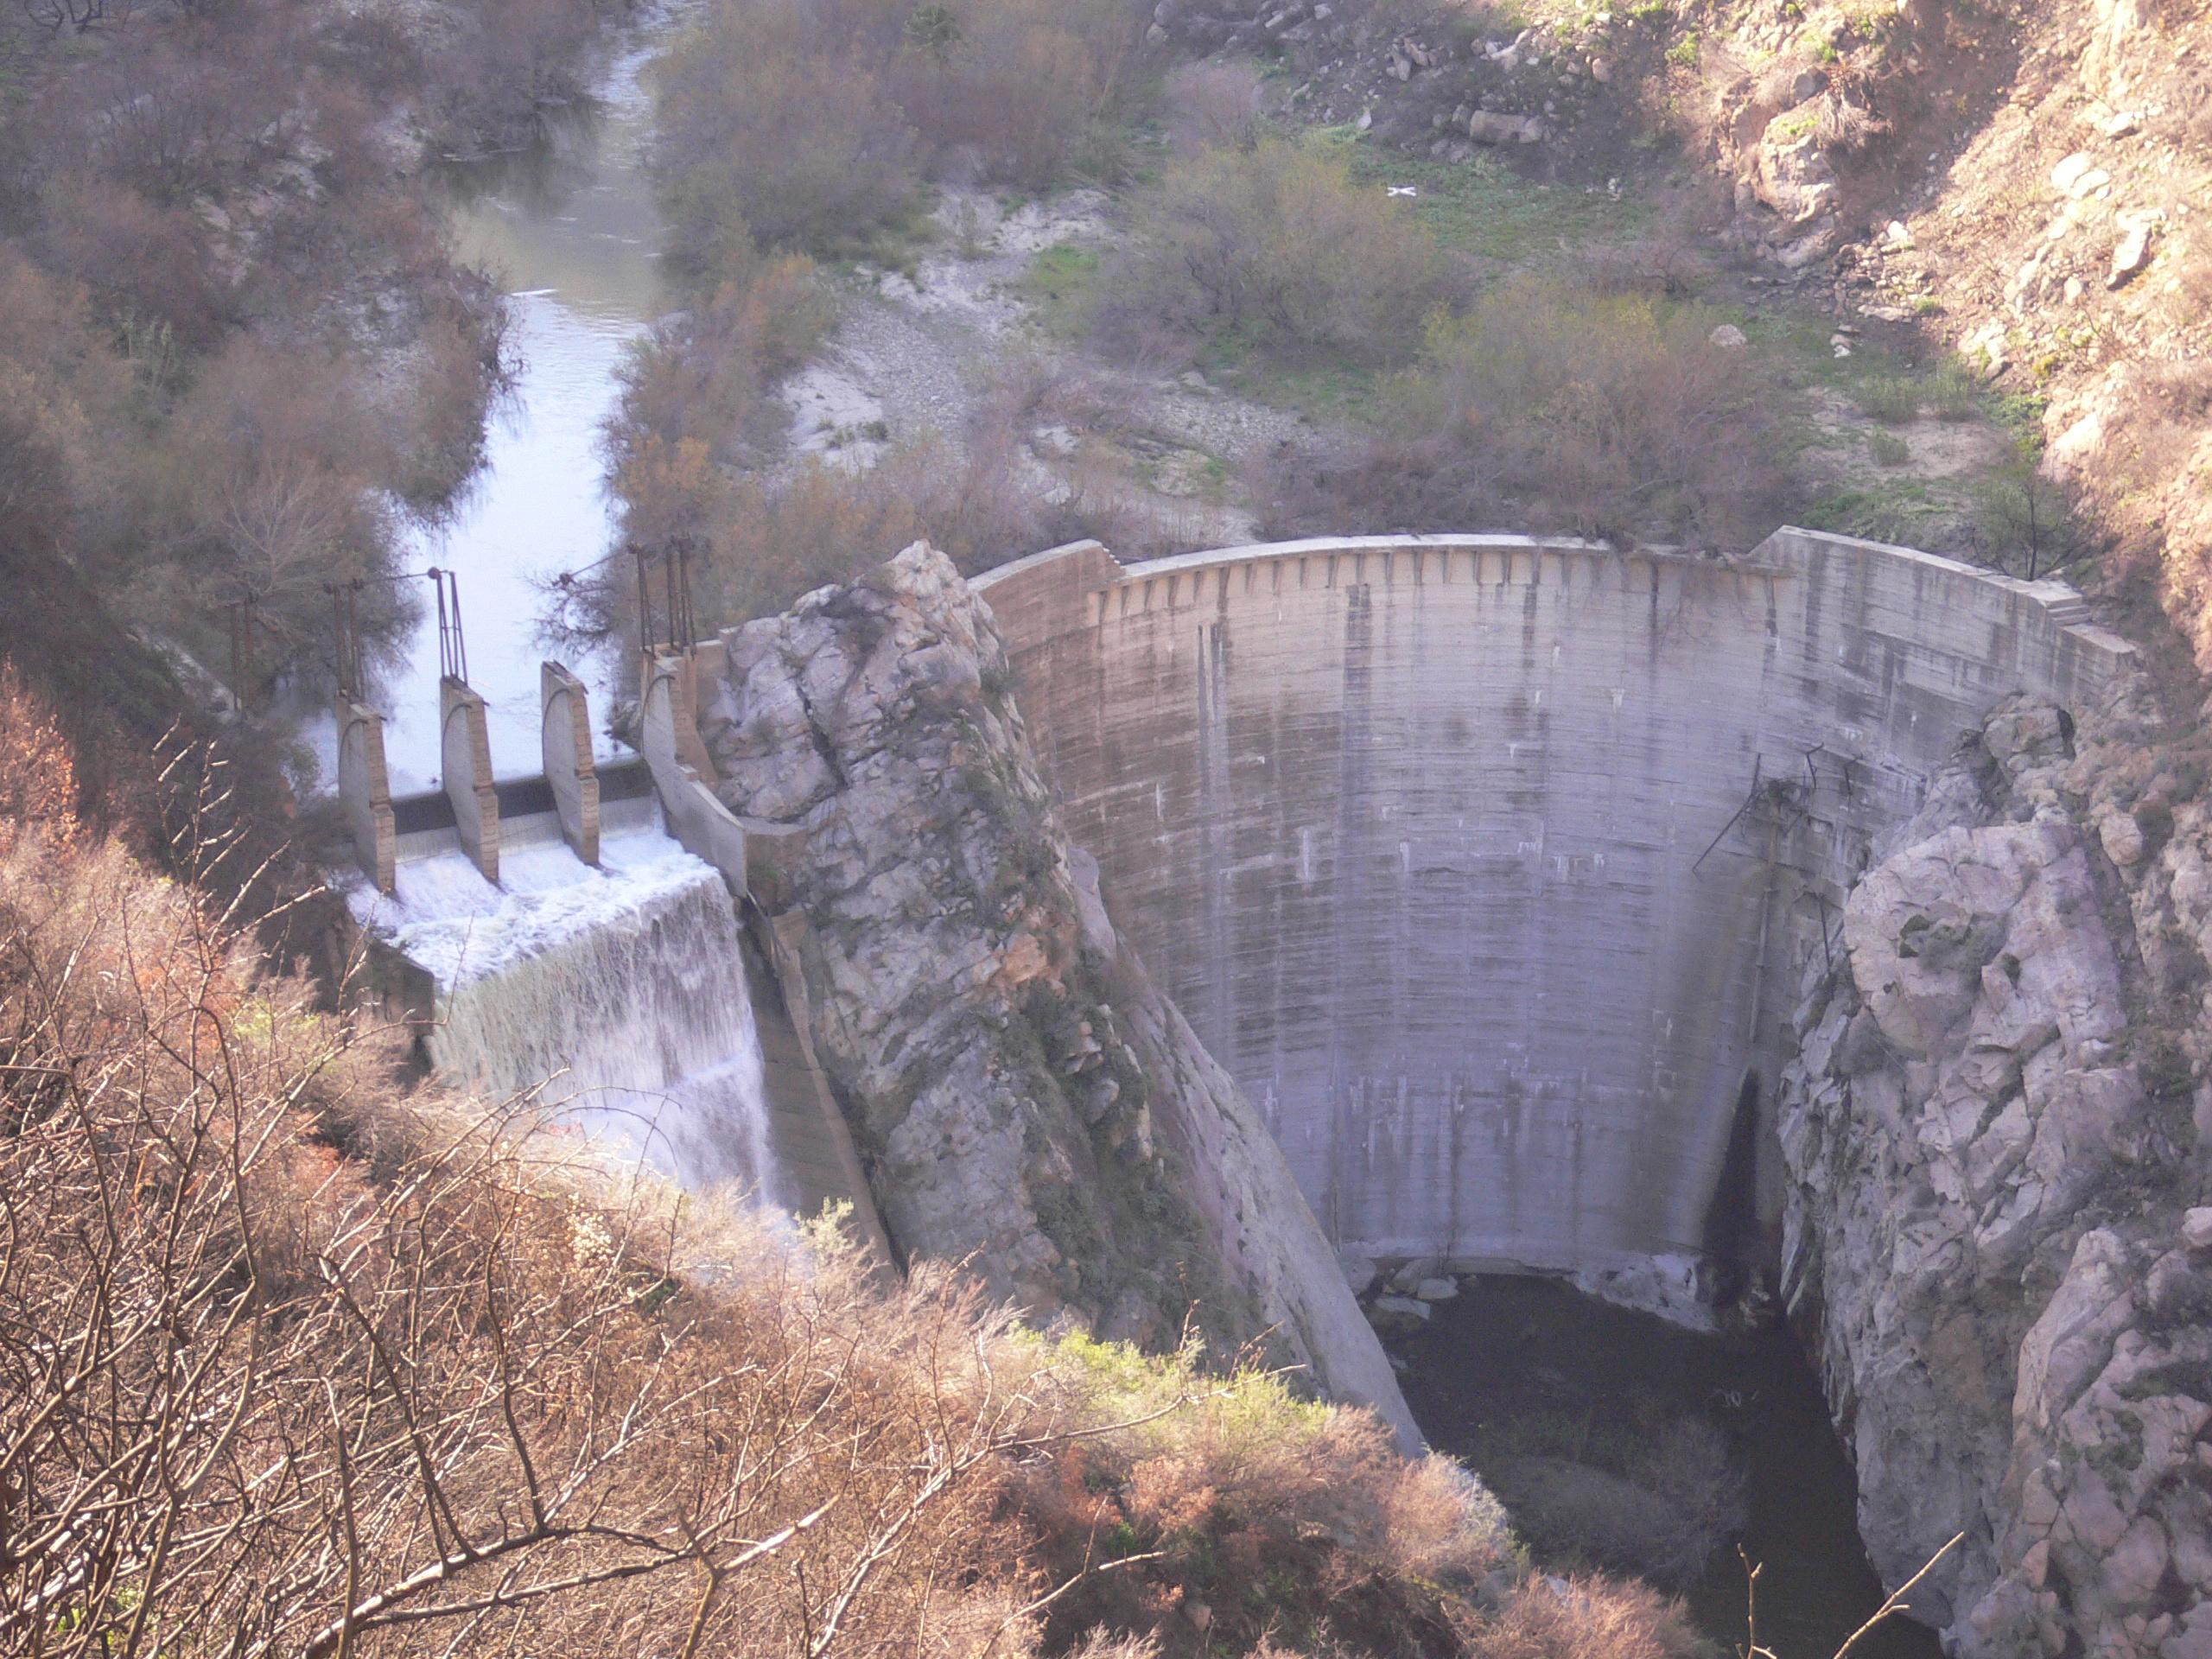 Rindge Dam Feb 08.jpg (2560×1920)